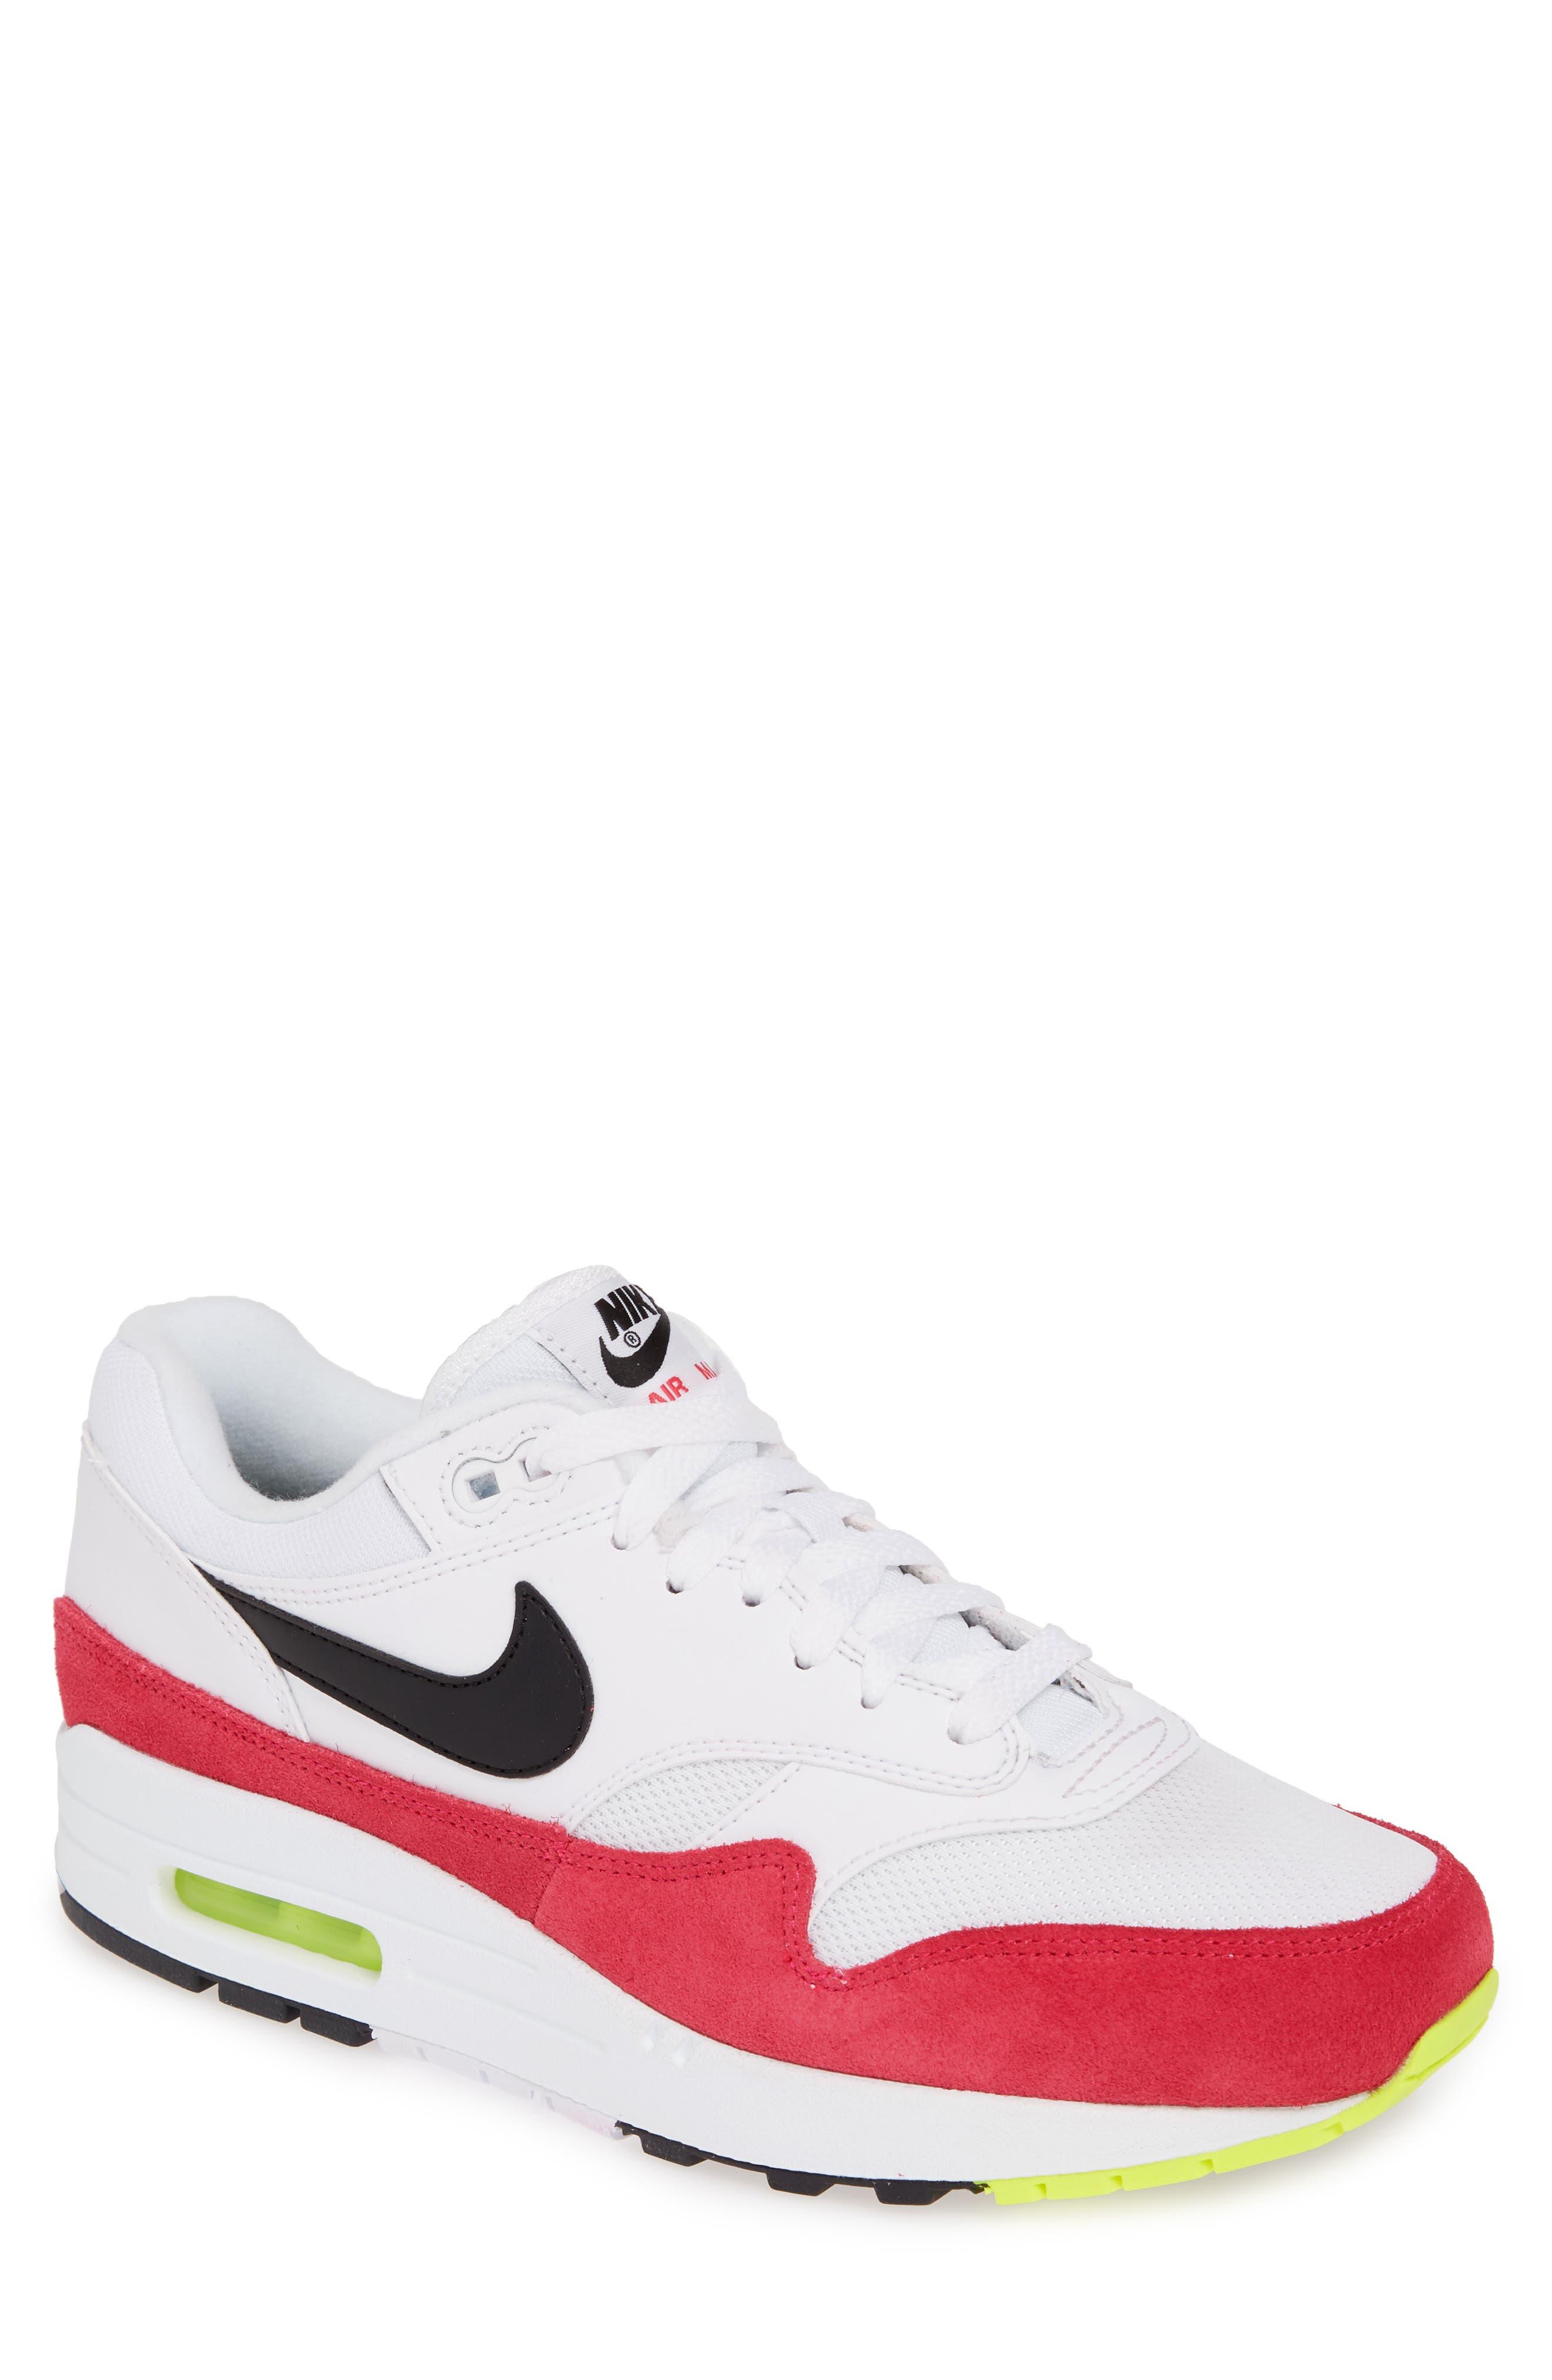 1ffeda5d324b80 Men s Nike Shoes